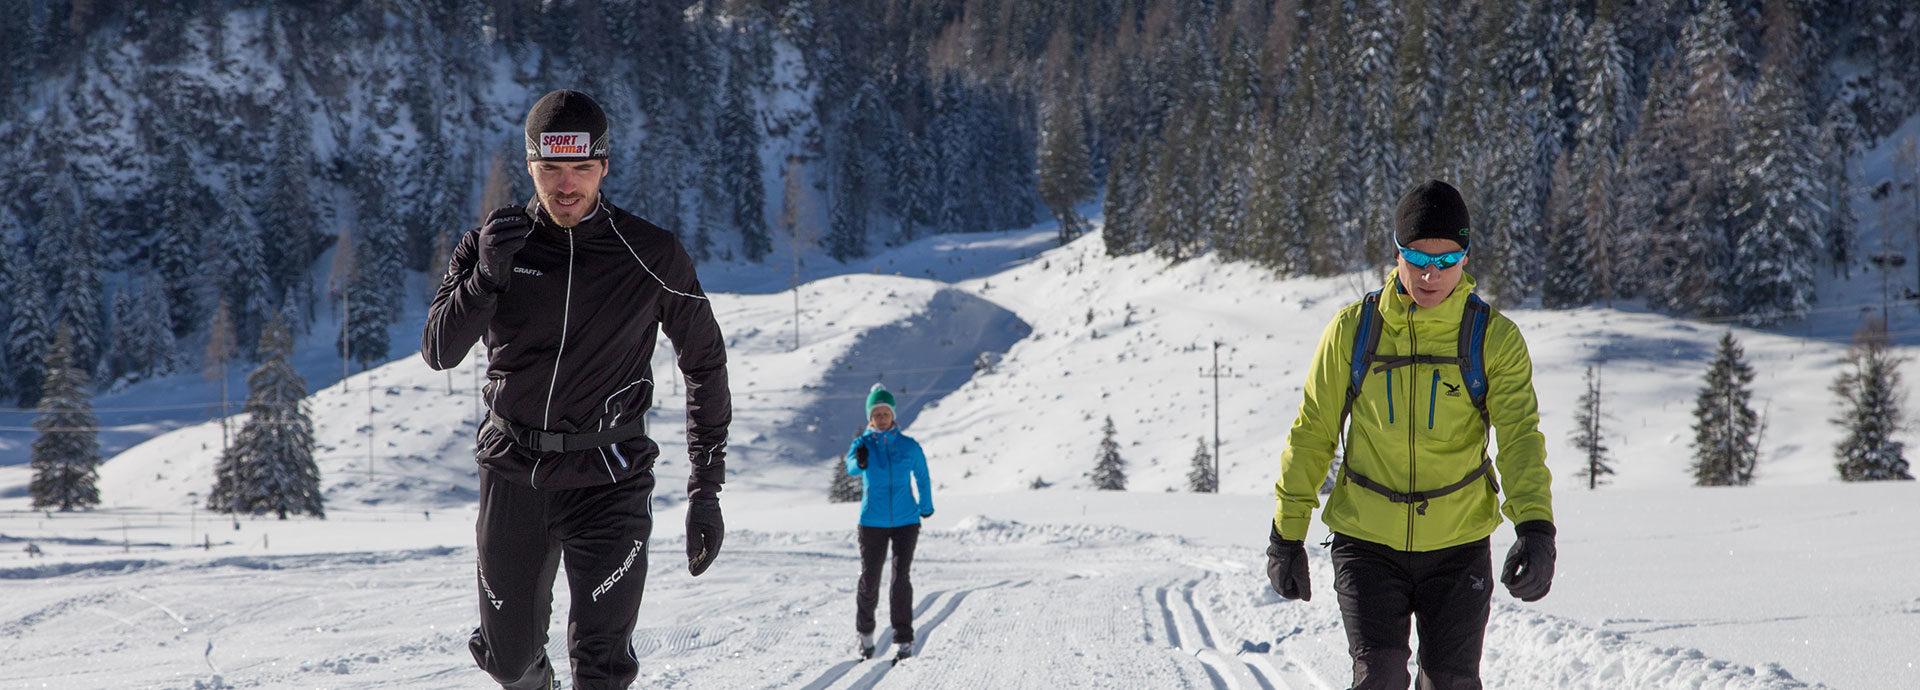 Langlauf-Kurse in Obertauern